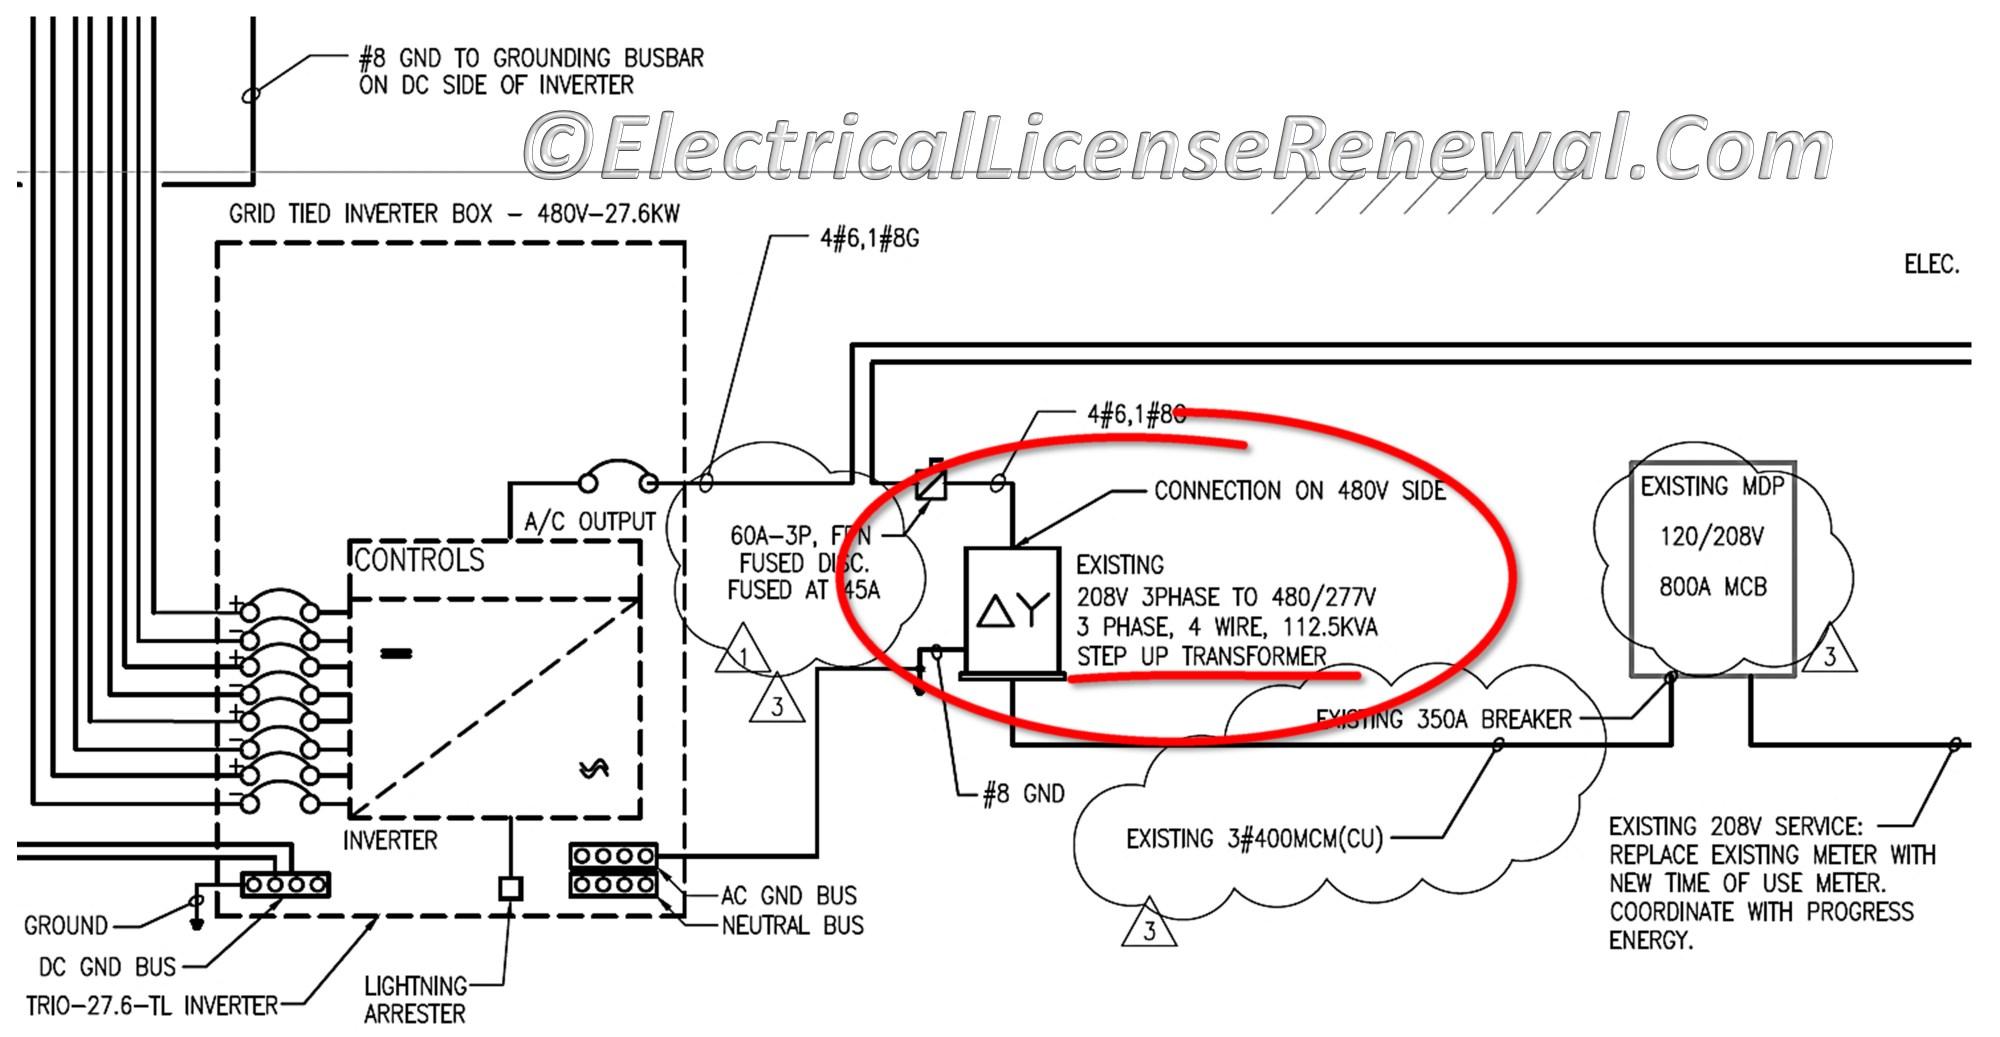 hight resolution of wiring diagram 208v 480v dry type transformers